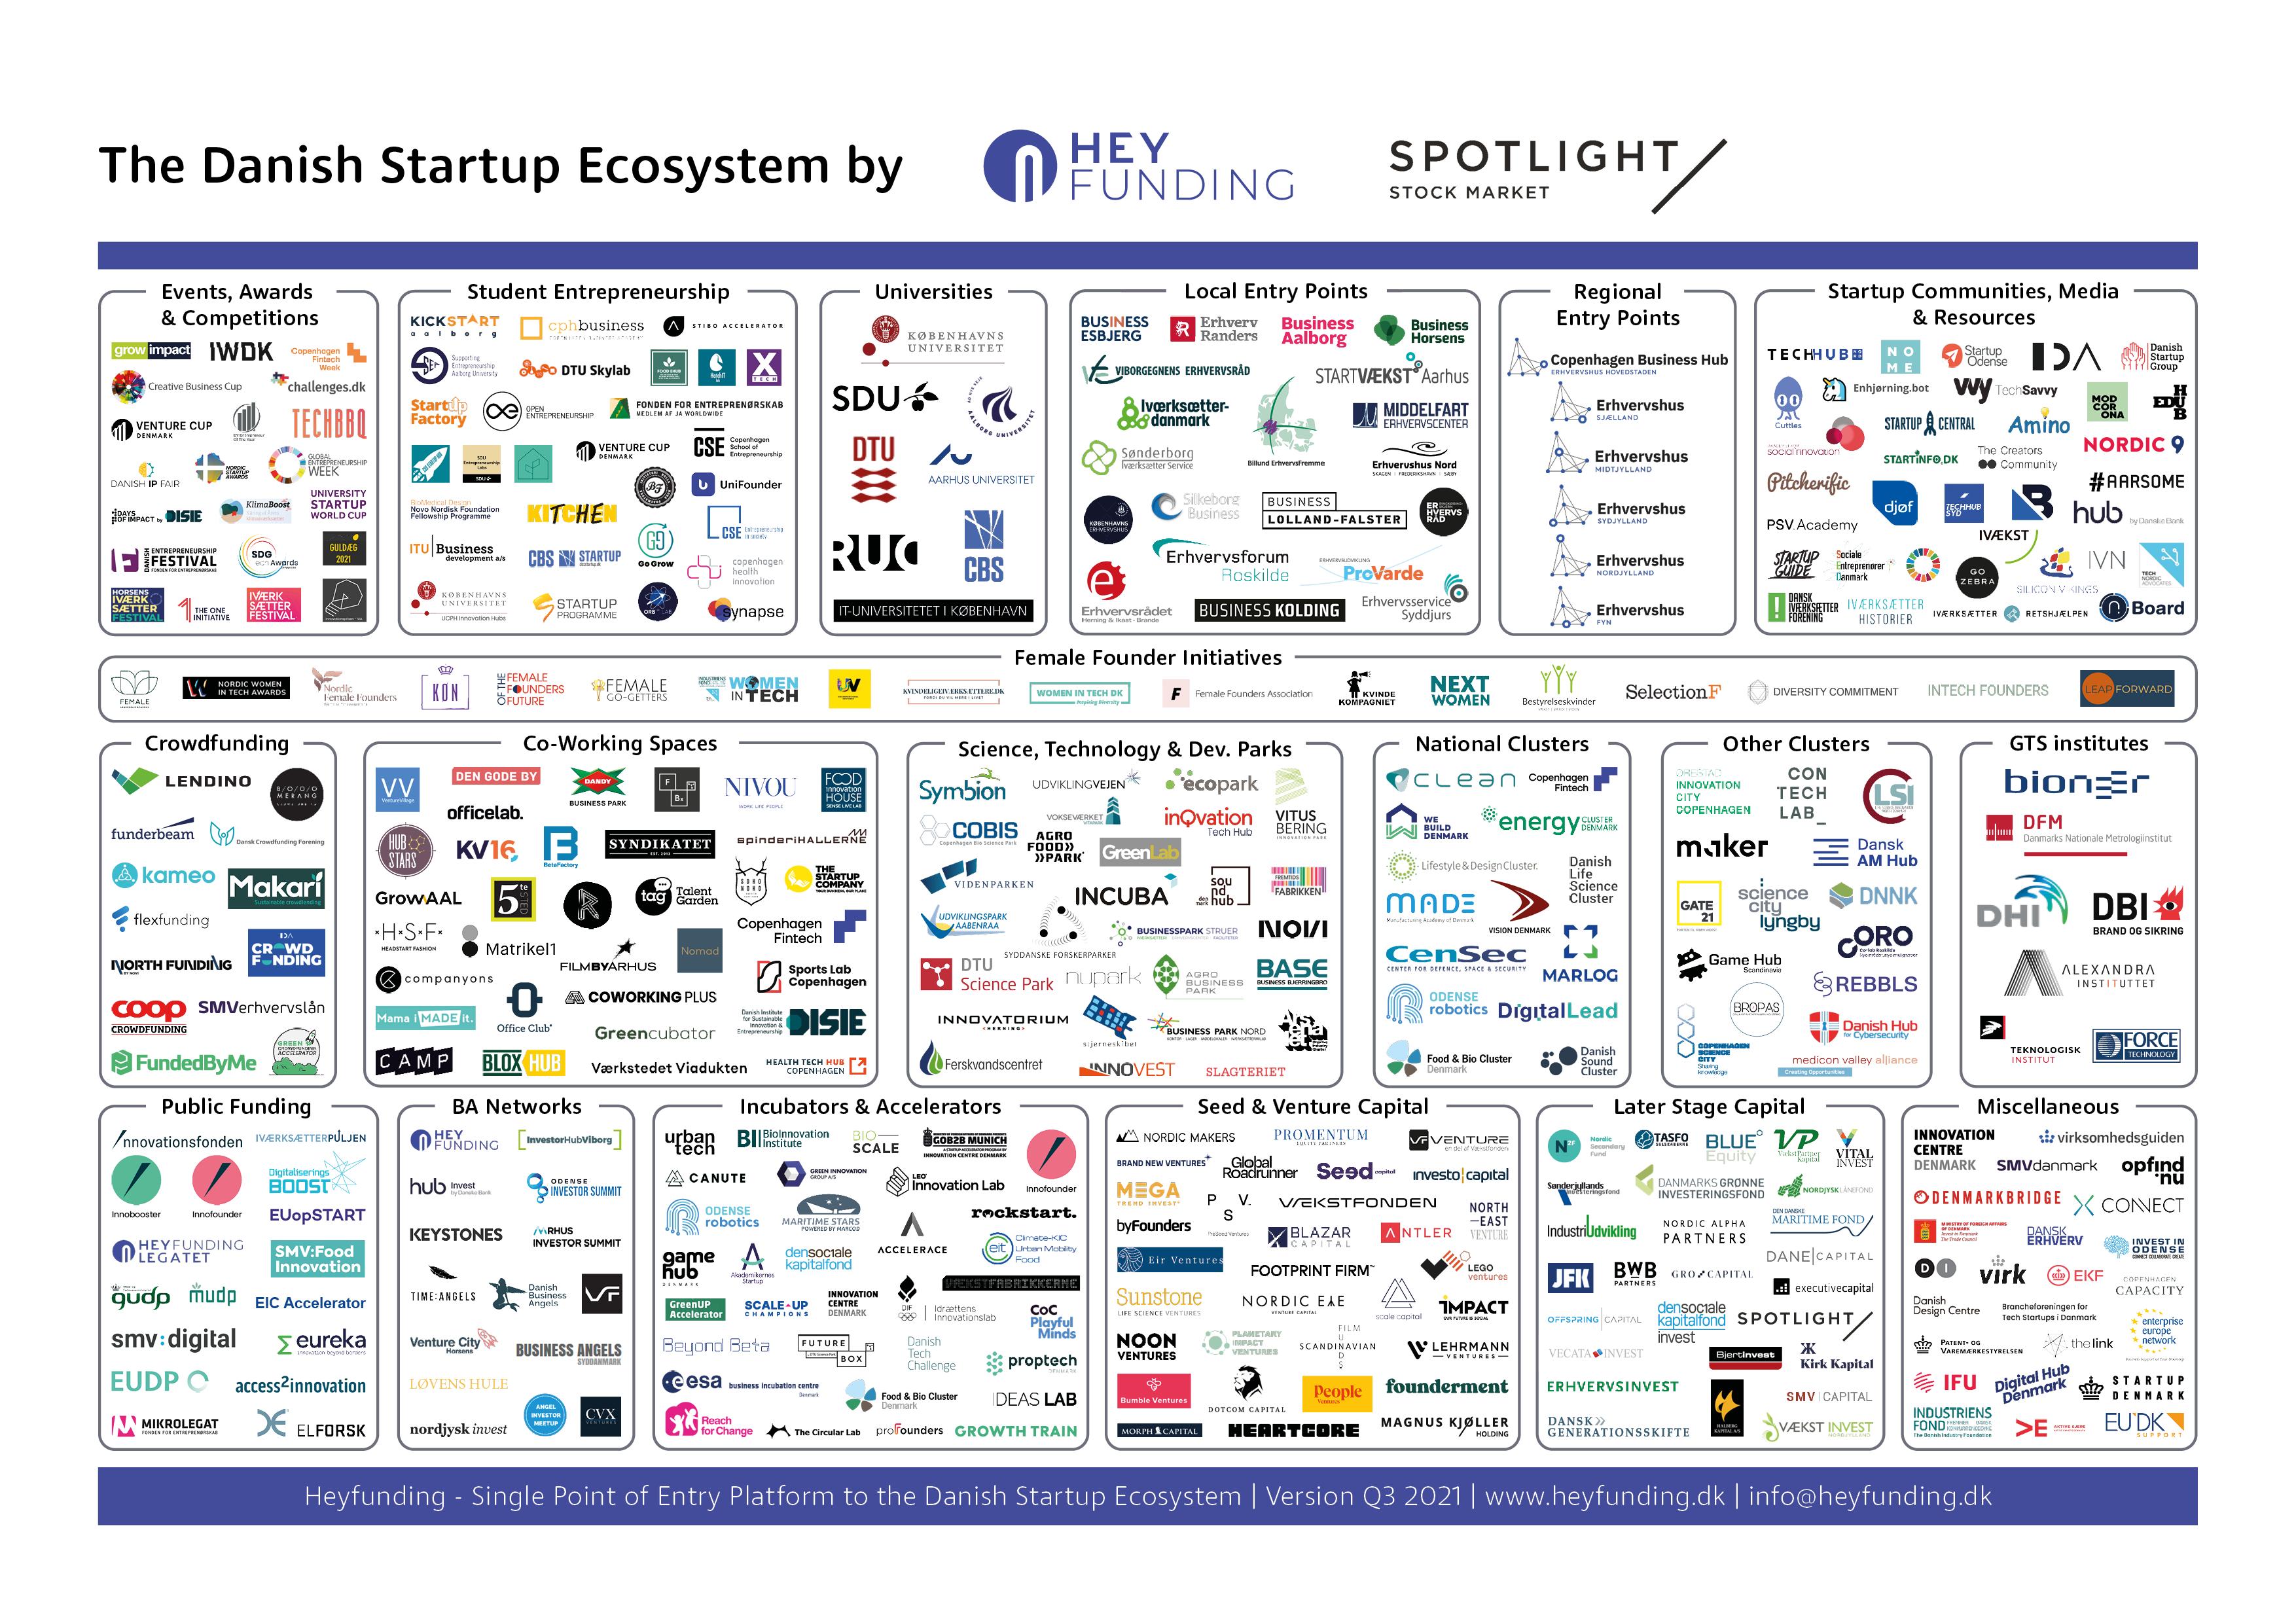 Det danske startup økosystem Q3 2021